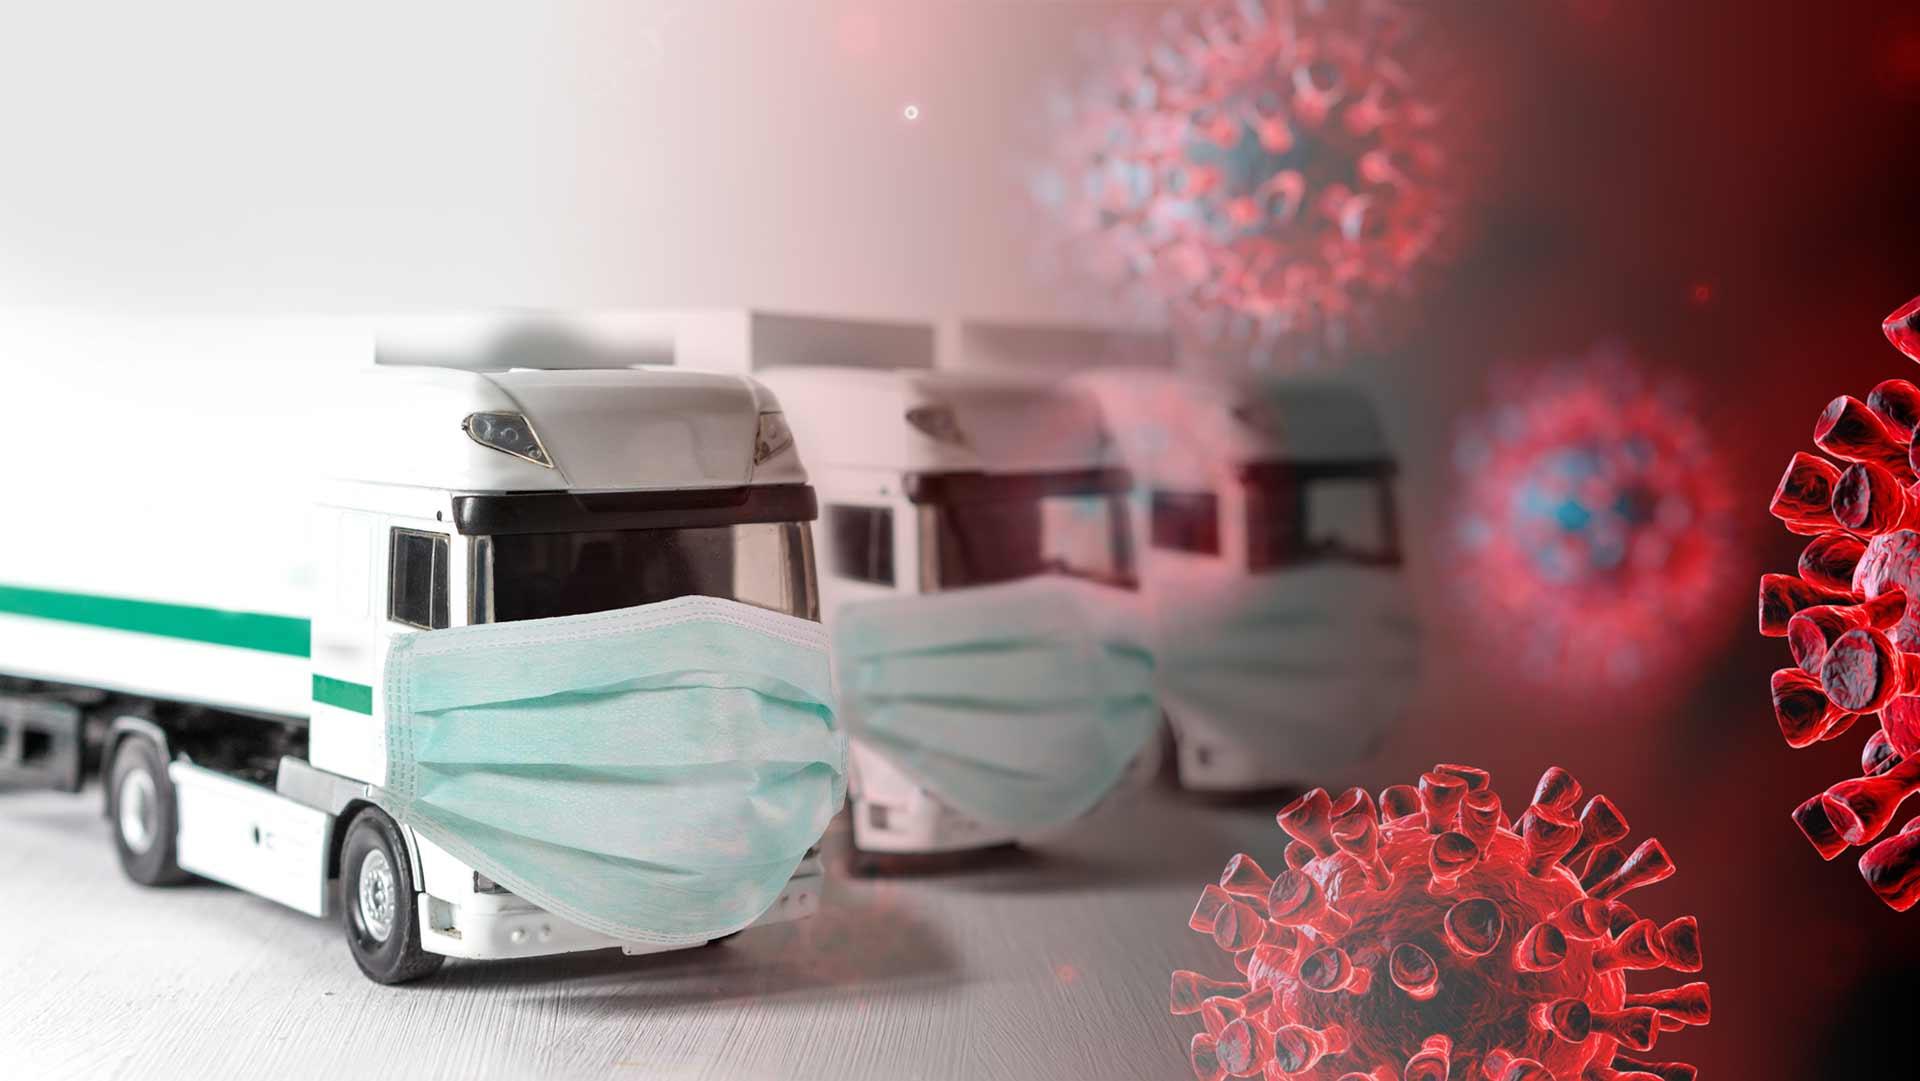 Trucks with maskes coronavirus 2 v2